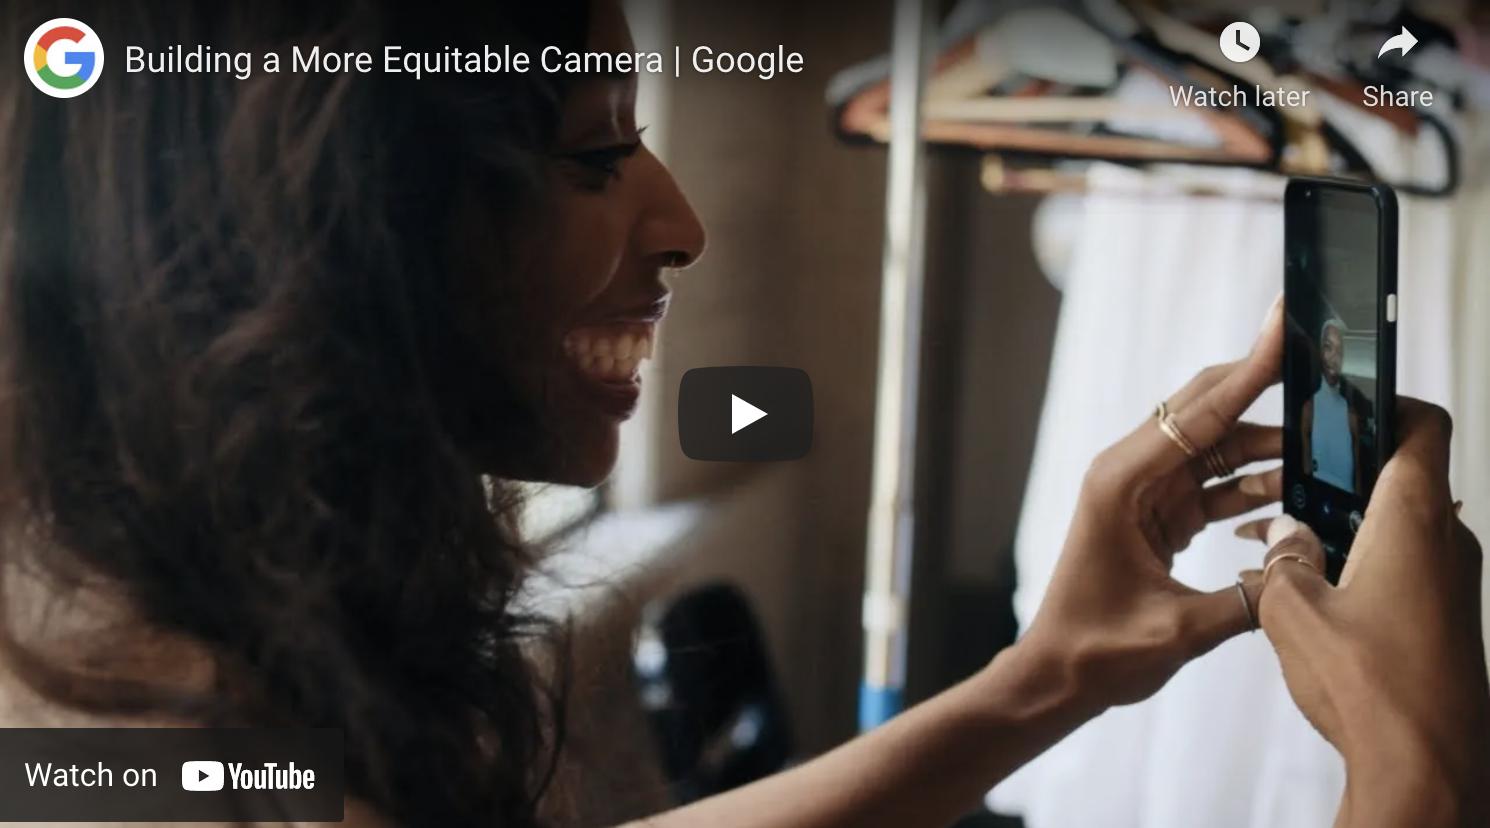 Building a more Equitable camera